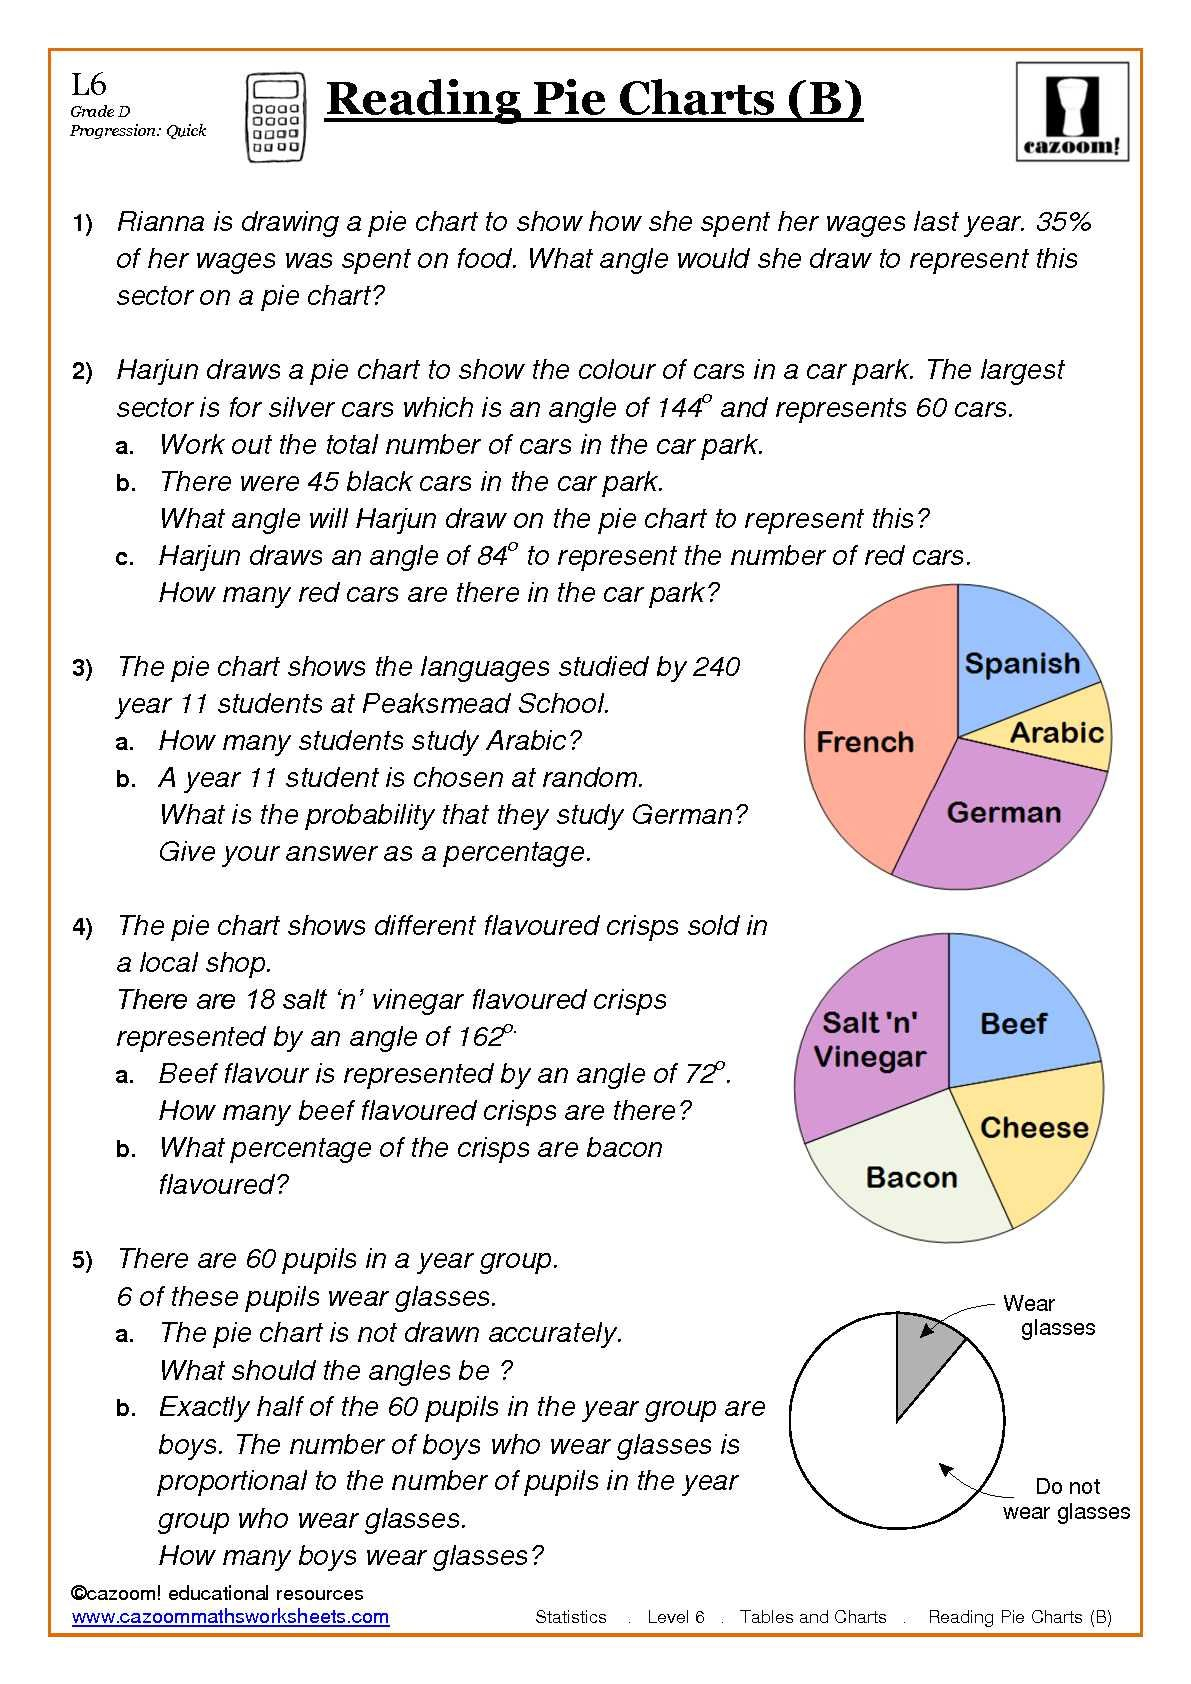 Maths Worksheets | Things To Wear | Math Worksheets, Worksheets For | Free Printable Statistics Worksheets